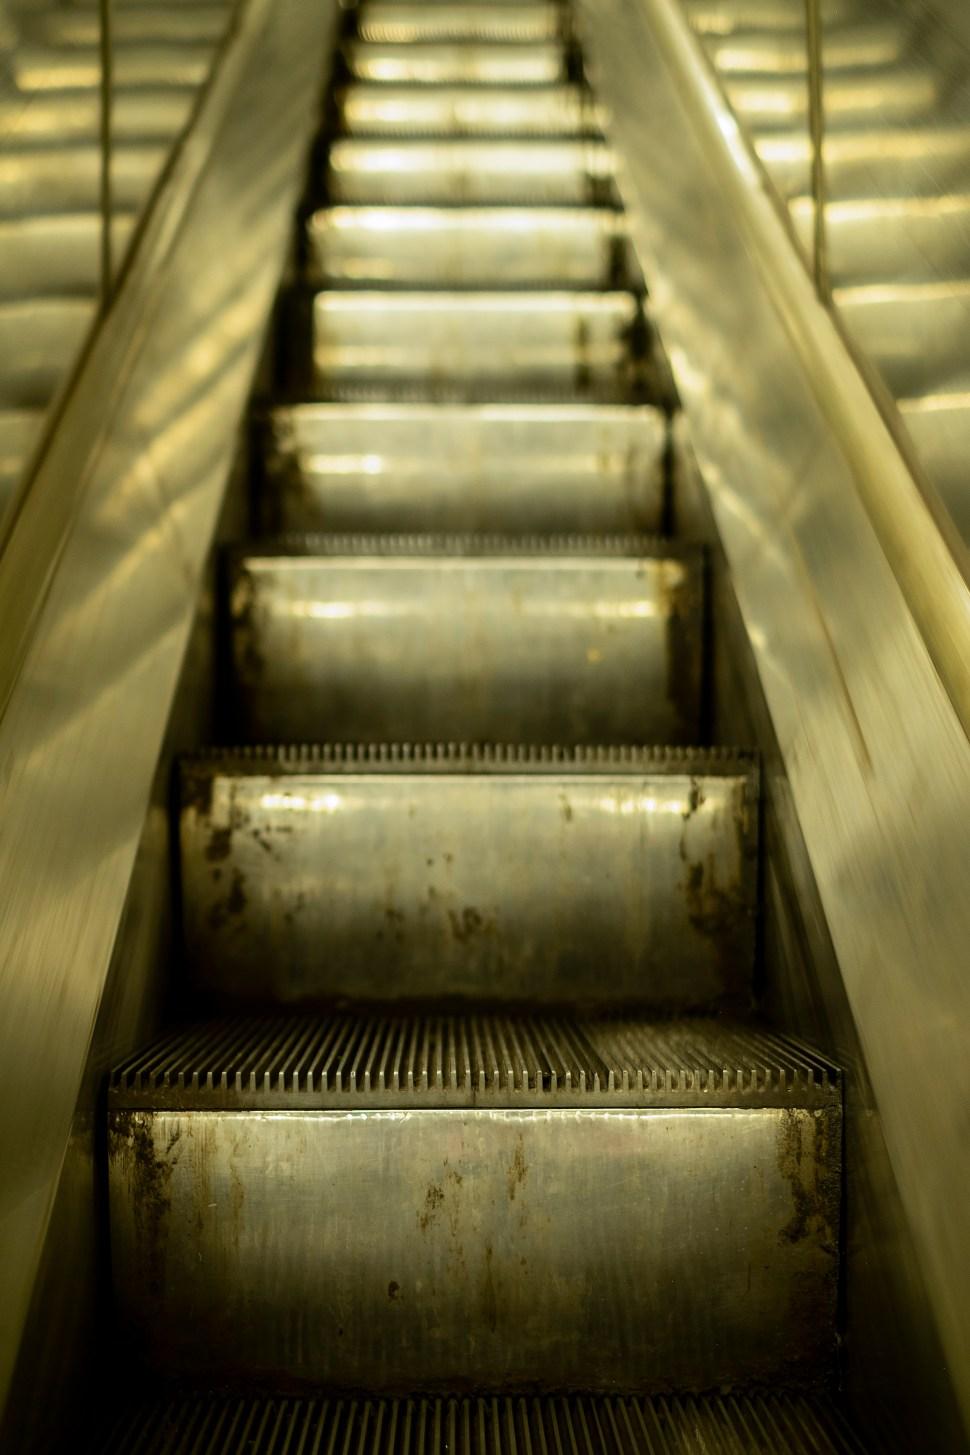 escalatorUp_DSF0739